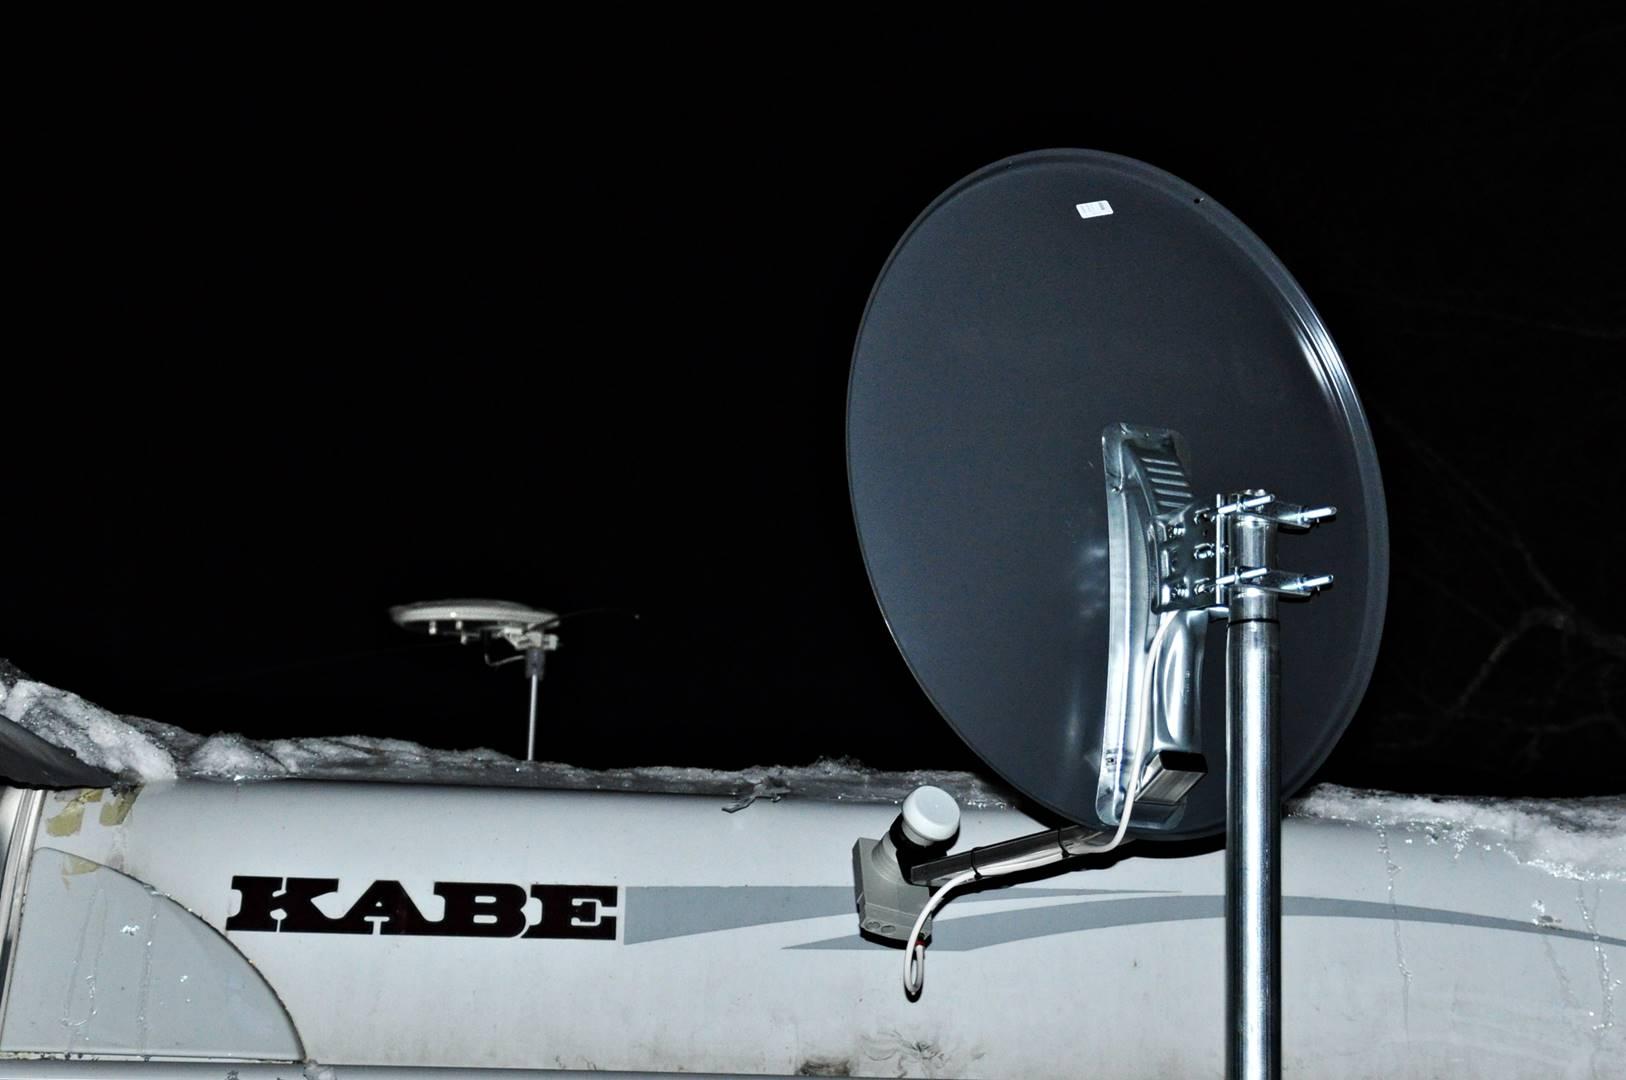 Nya Montering på husvagn. - Gestrike antennservice XT-06